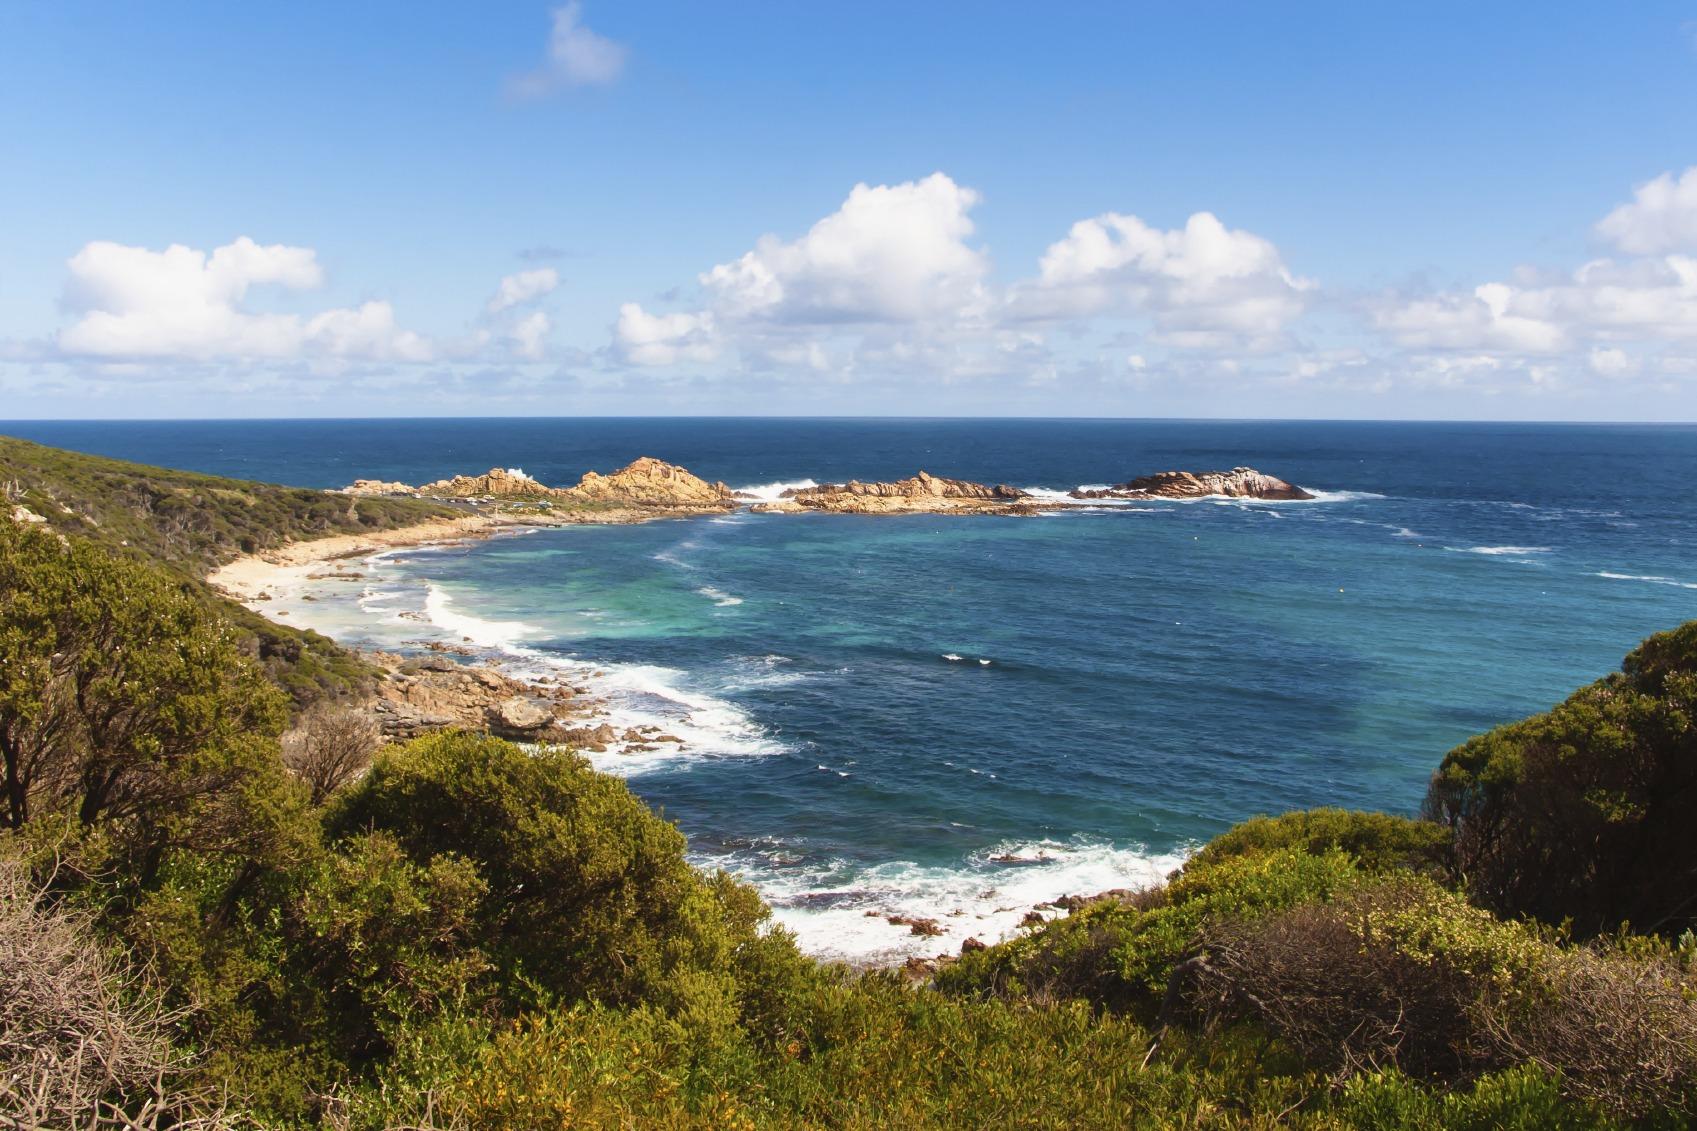 yallingup-beach-western-australia.jpg